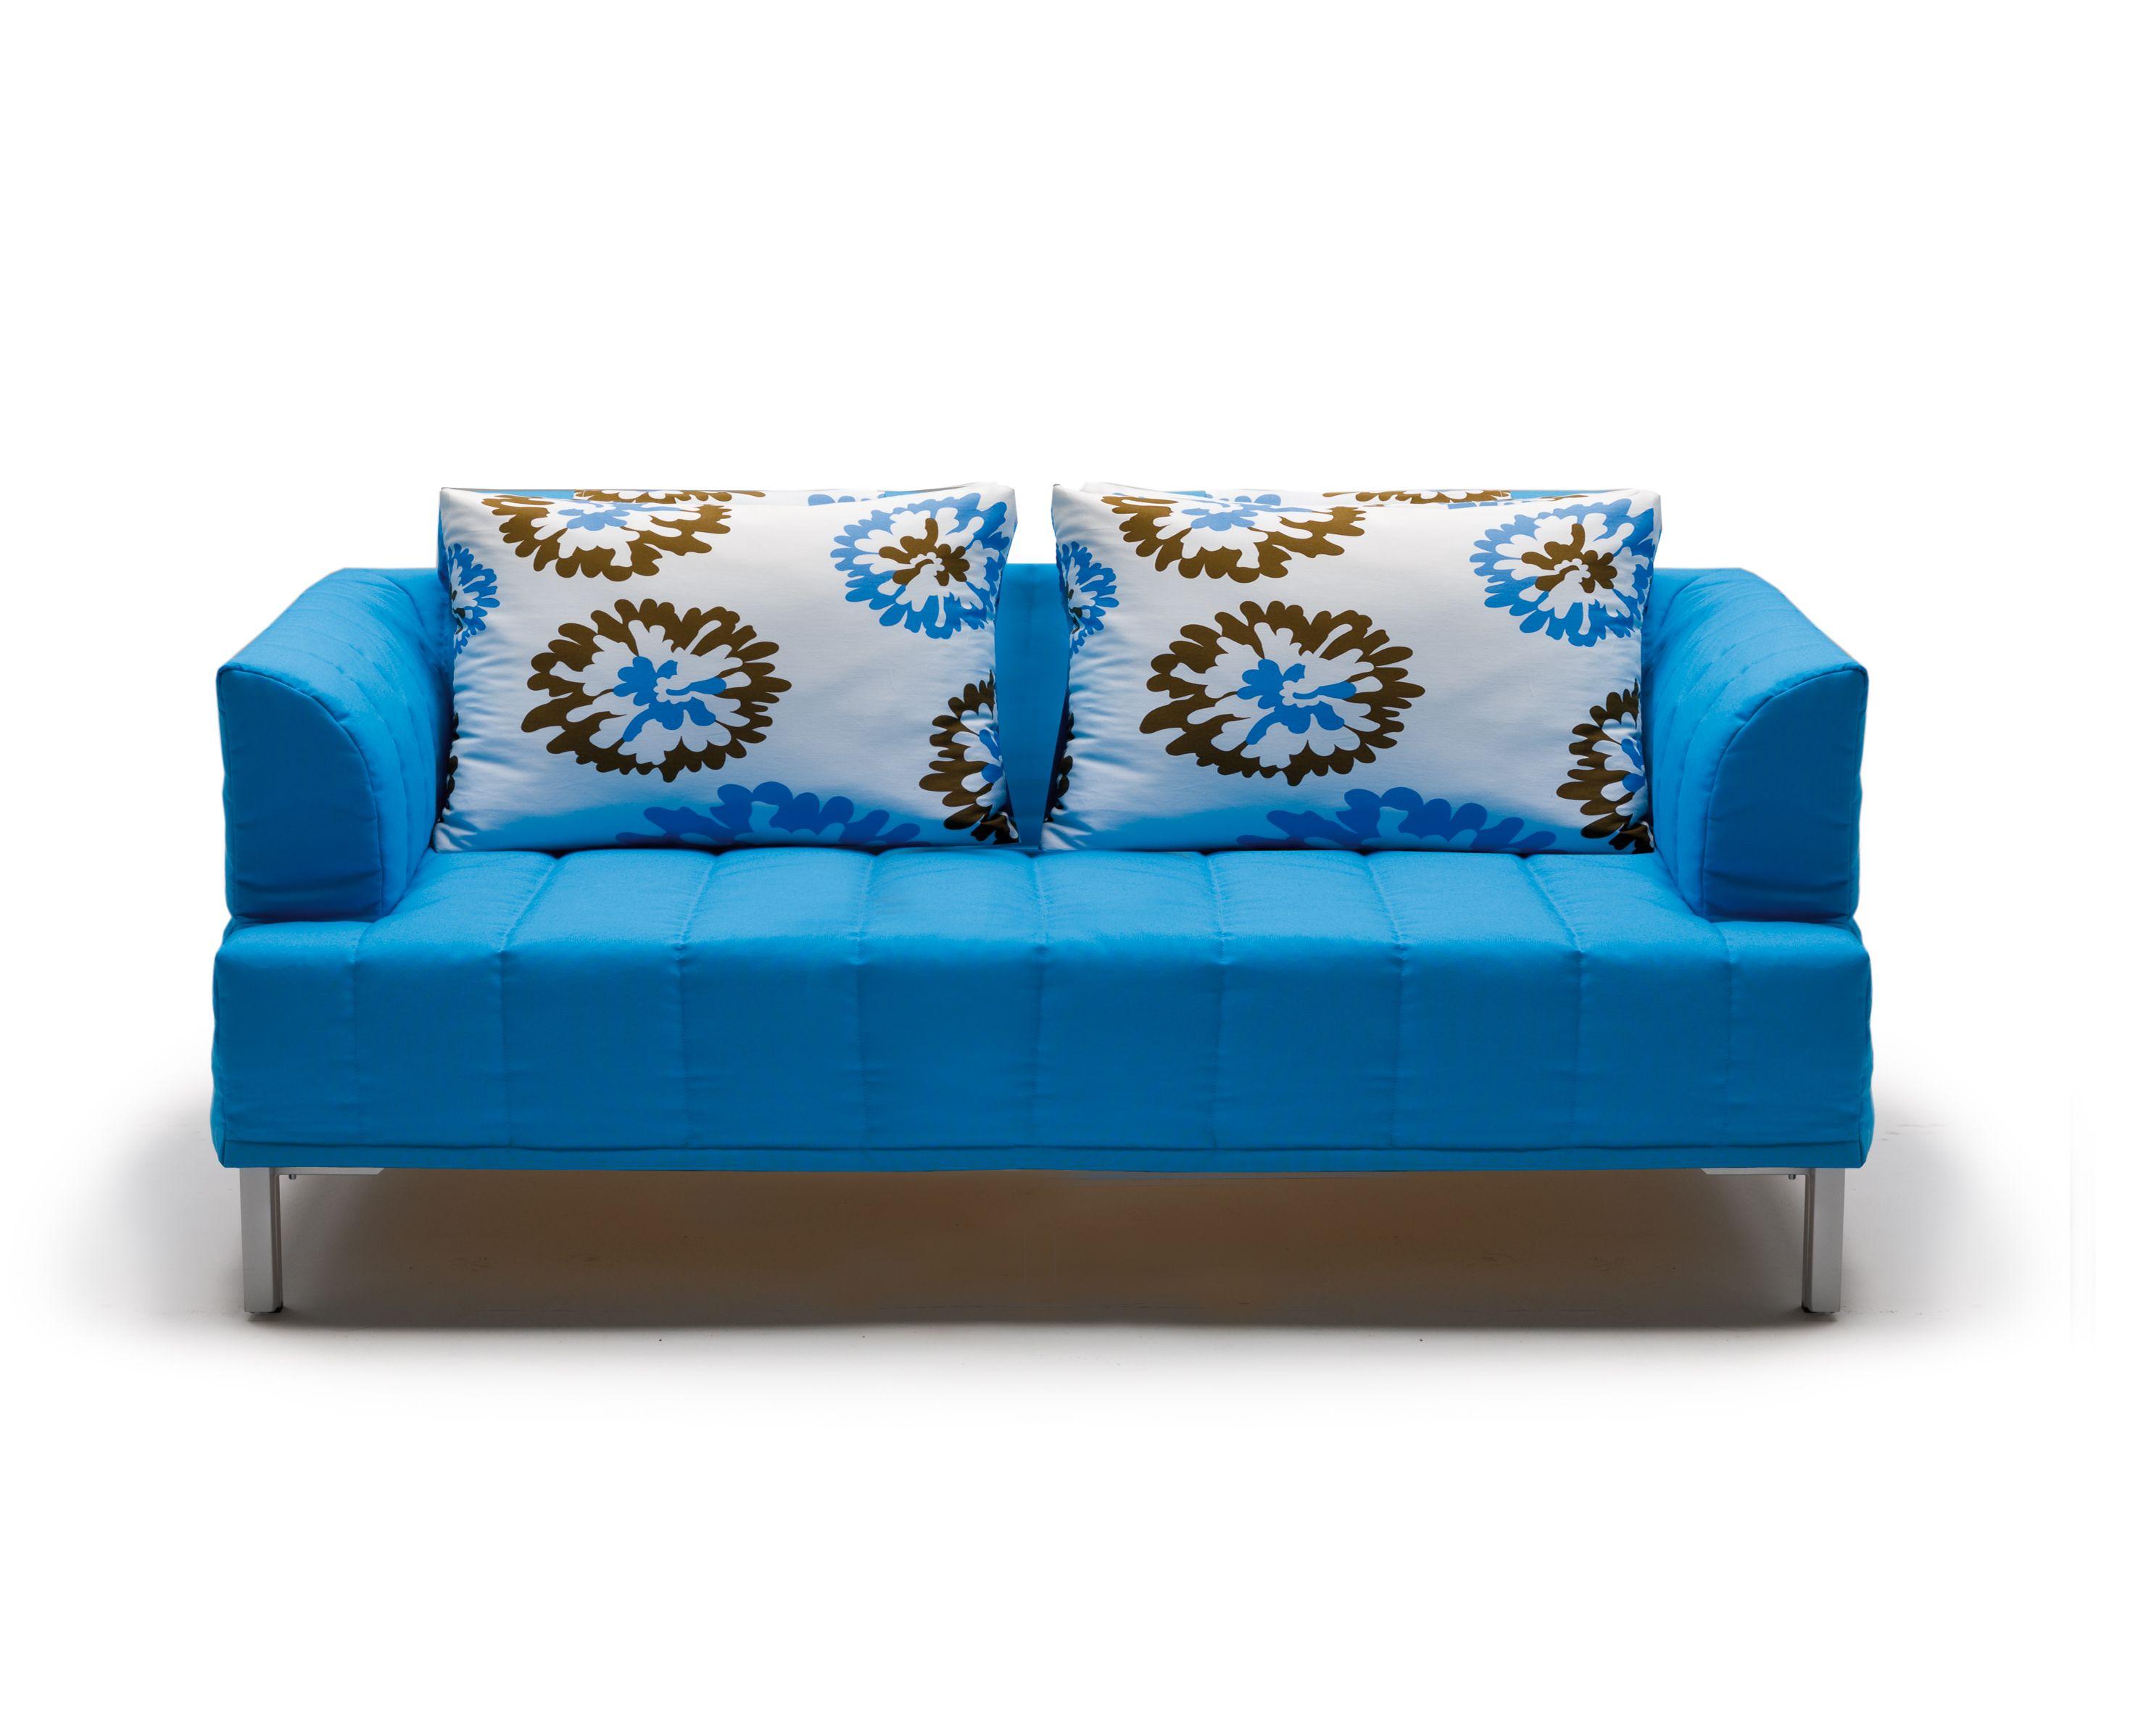 Sofa and sofa bed Ellington by Milano Bedding